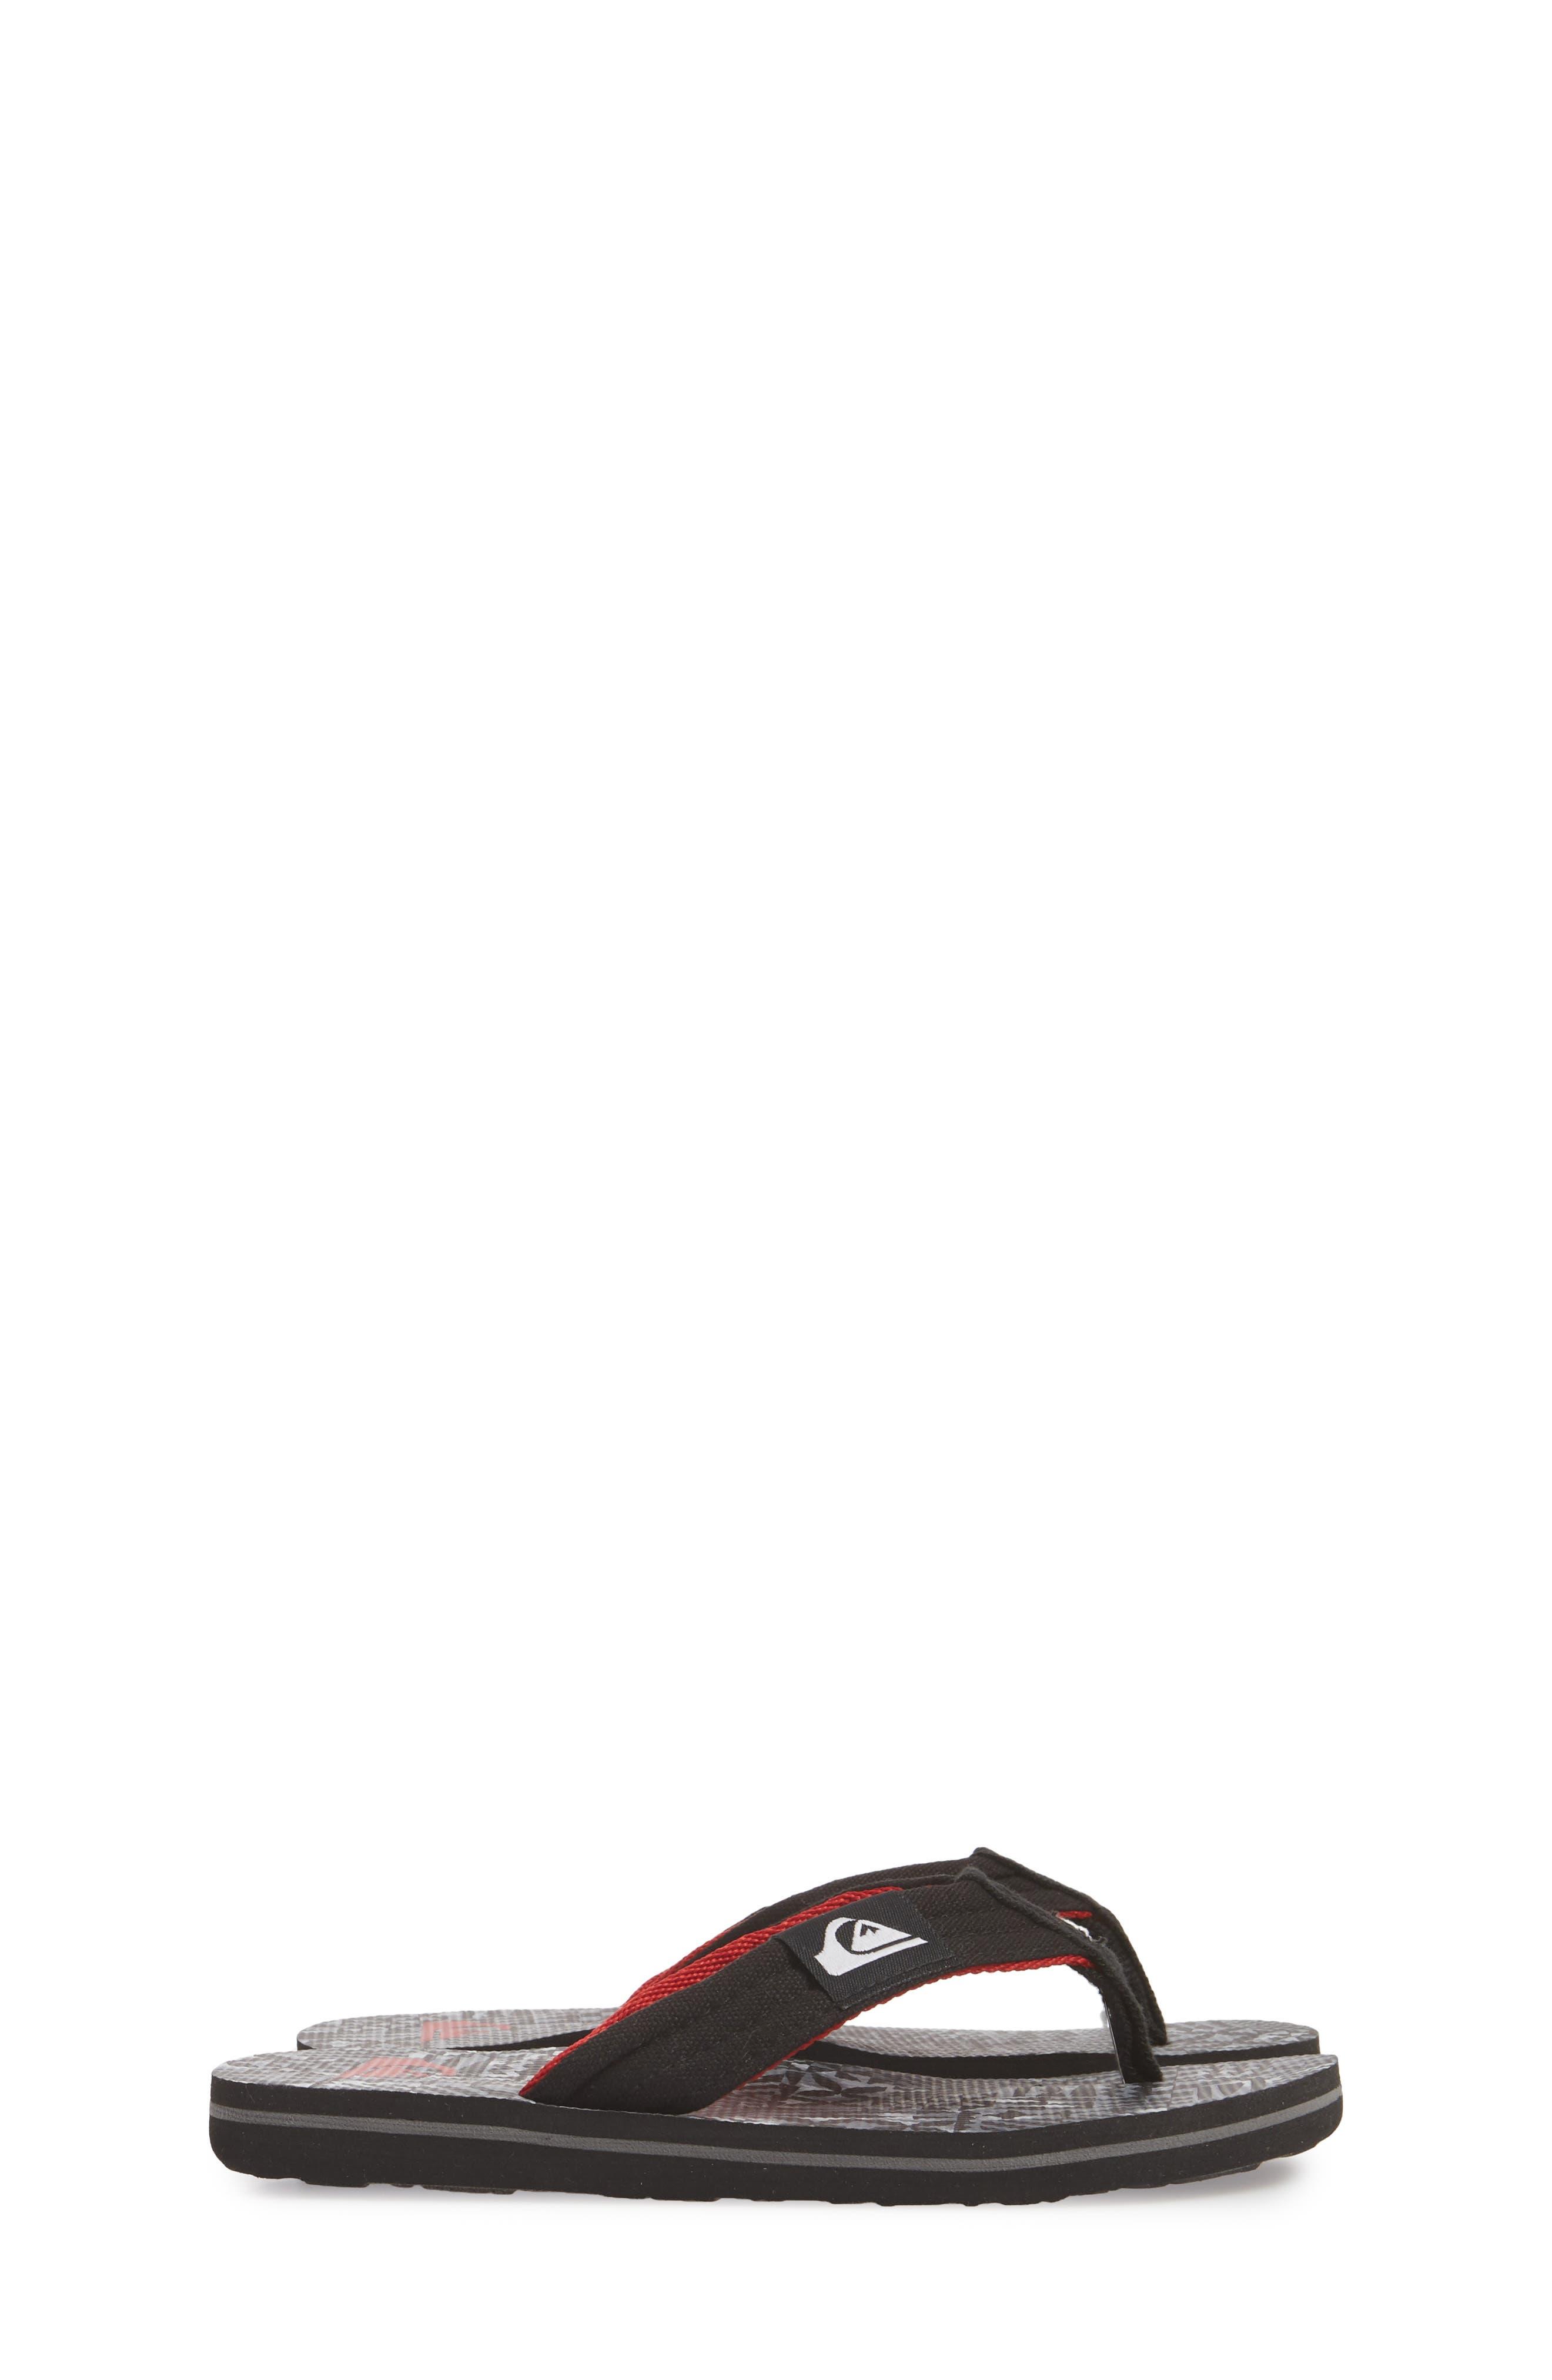 Molokai Layback Flip Flop,                             Alternate thumbnail 4, color,                             002